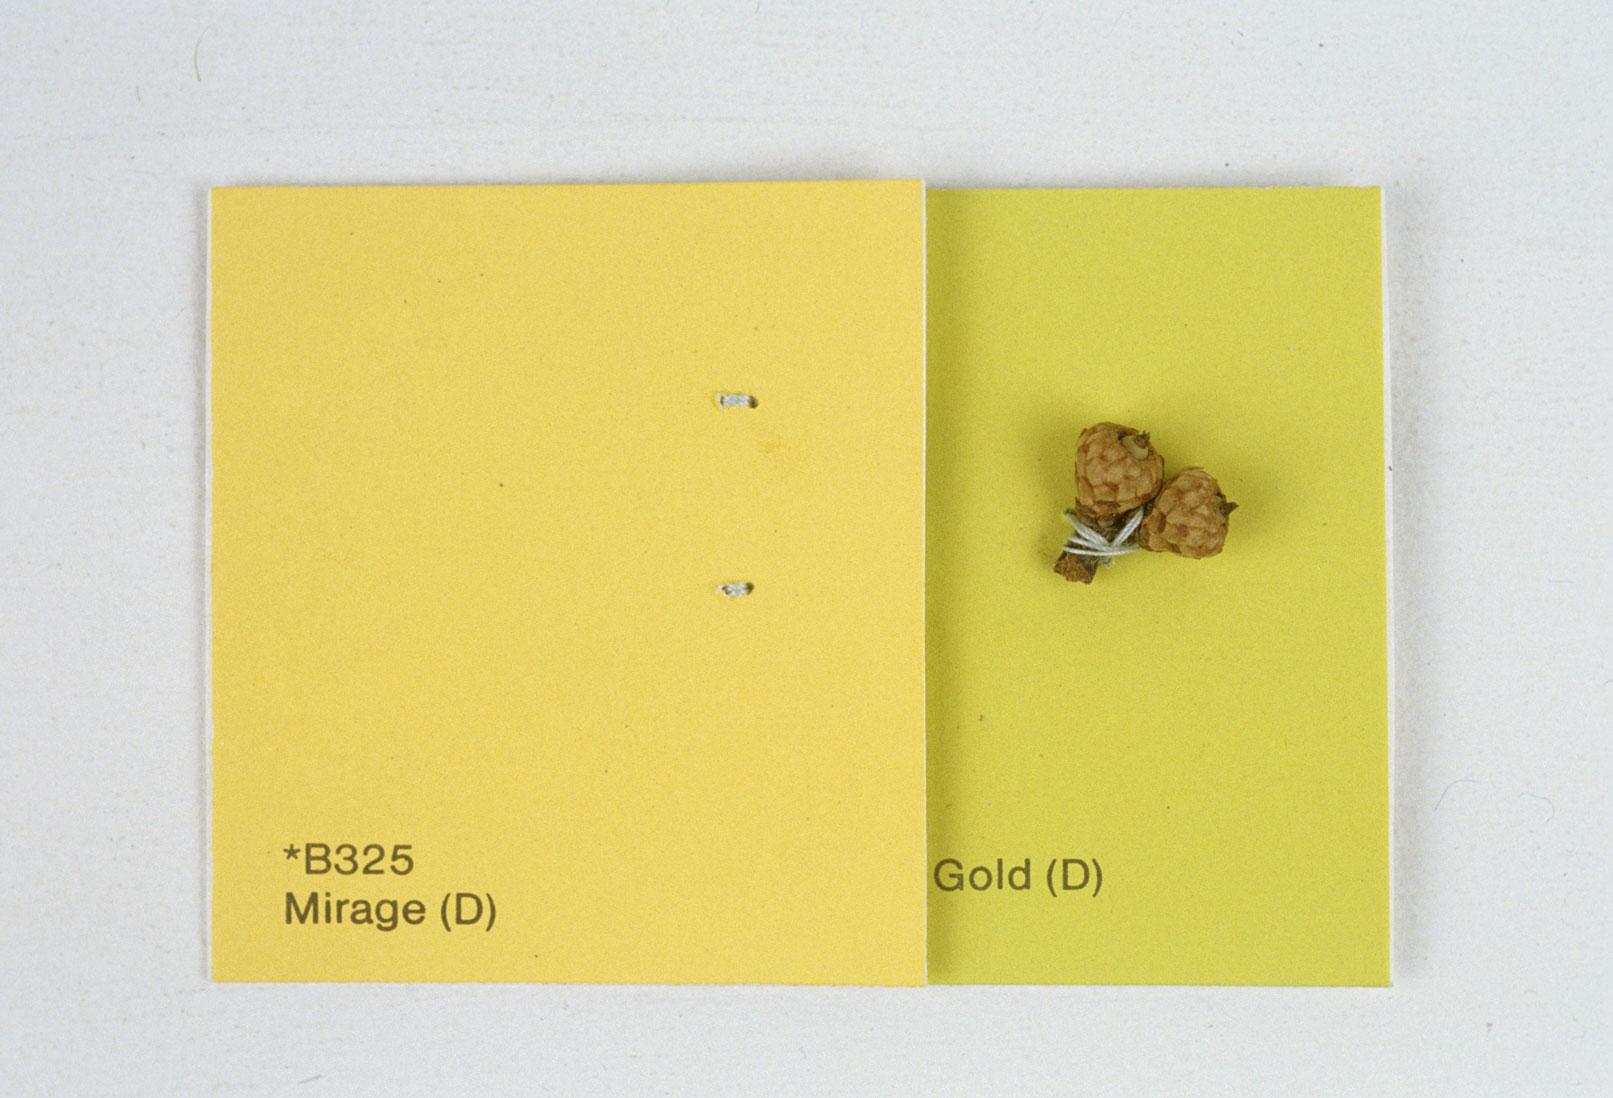 KS93_Mirage_baby-acorns-sewn-on-paint-chips_2x4_web.jpg